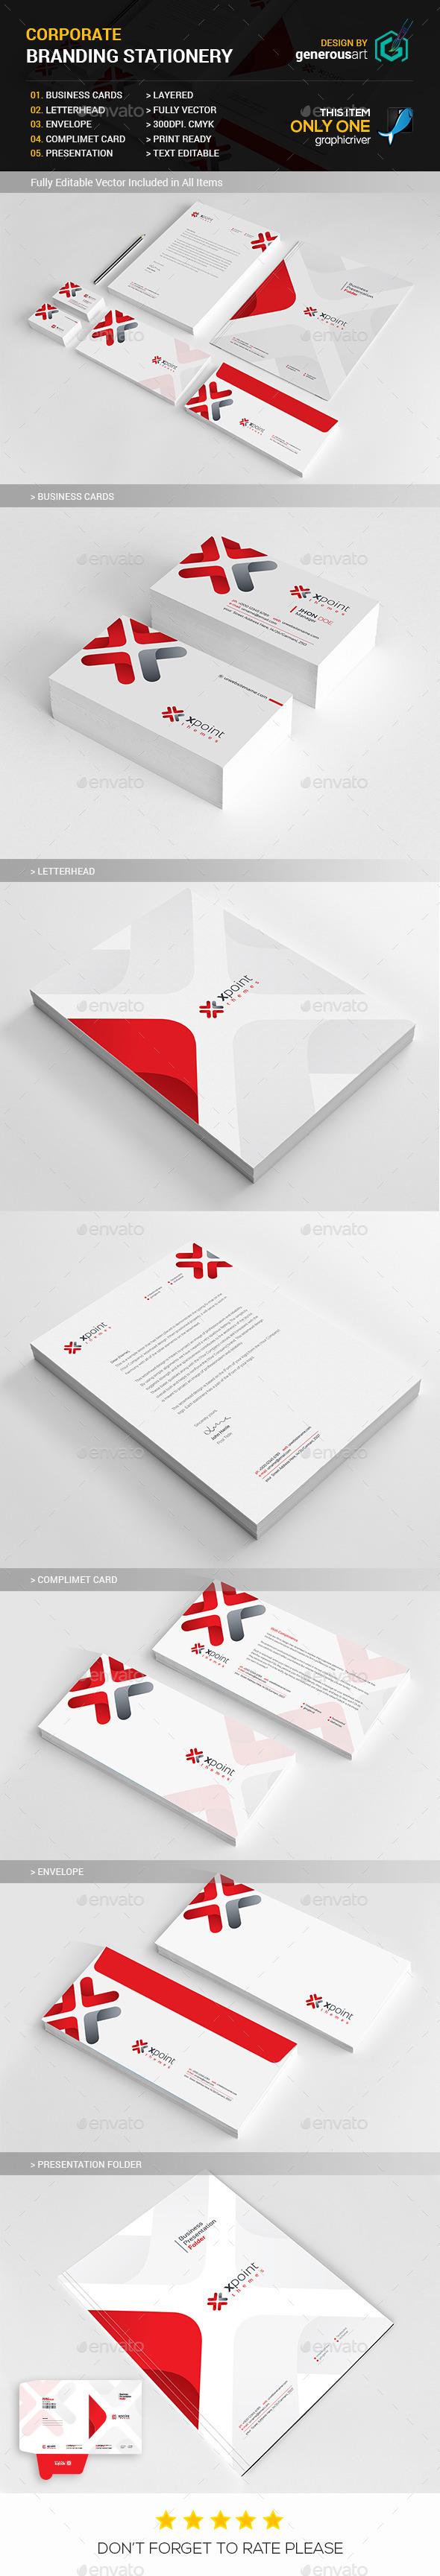 Branding Stationery_2 - Stationery Print Templates